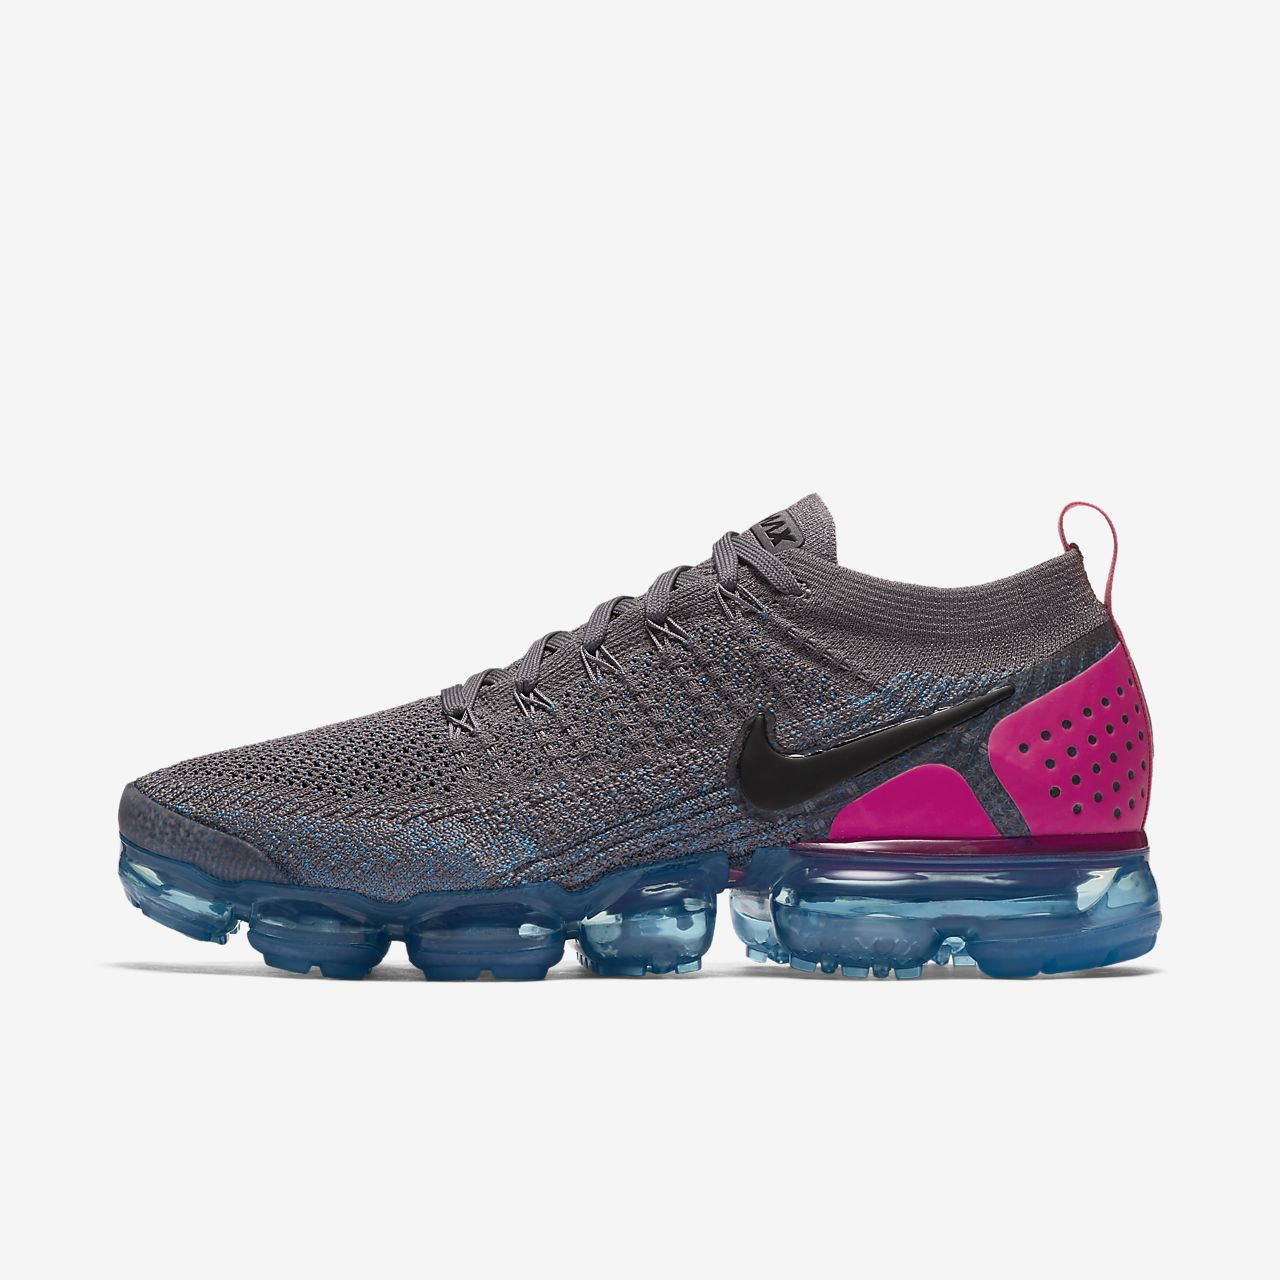 Mens Nike Air VaporMax Flyknit 2 Gunsmoke/Black/Blue Orbit/Pink Blast 942842 004